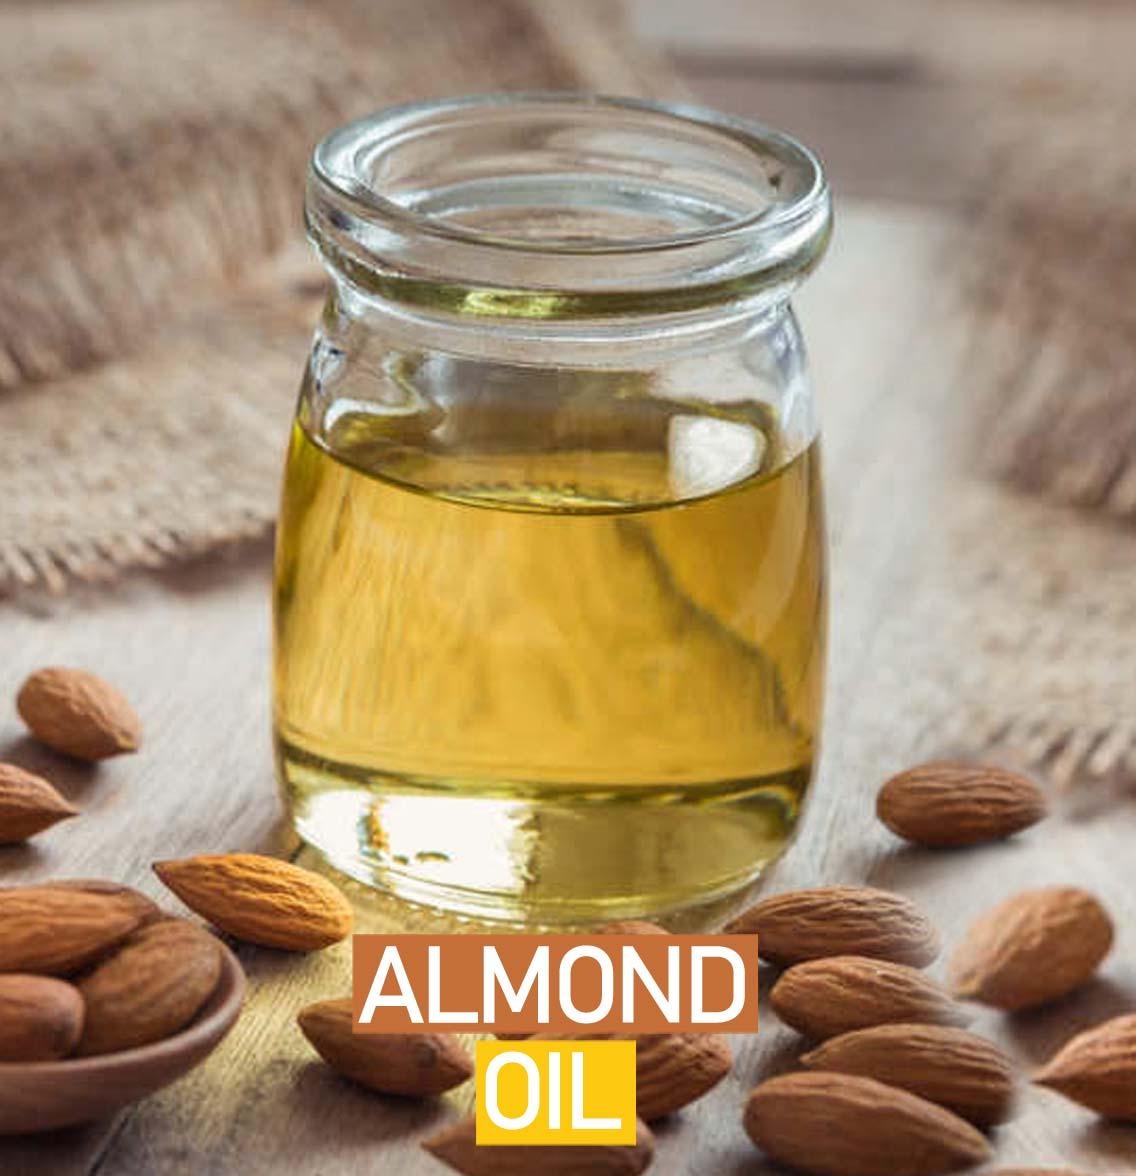 Badam Tel - 10 Amazing Health Benefits of Almond Oil